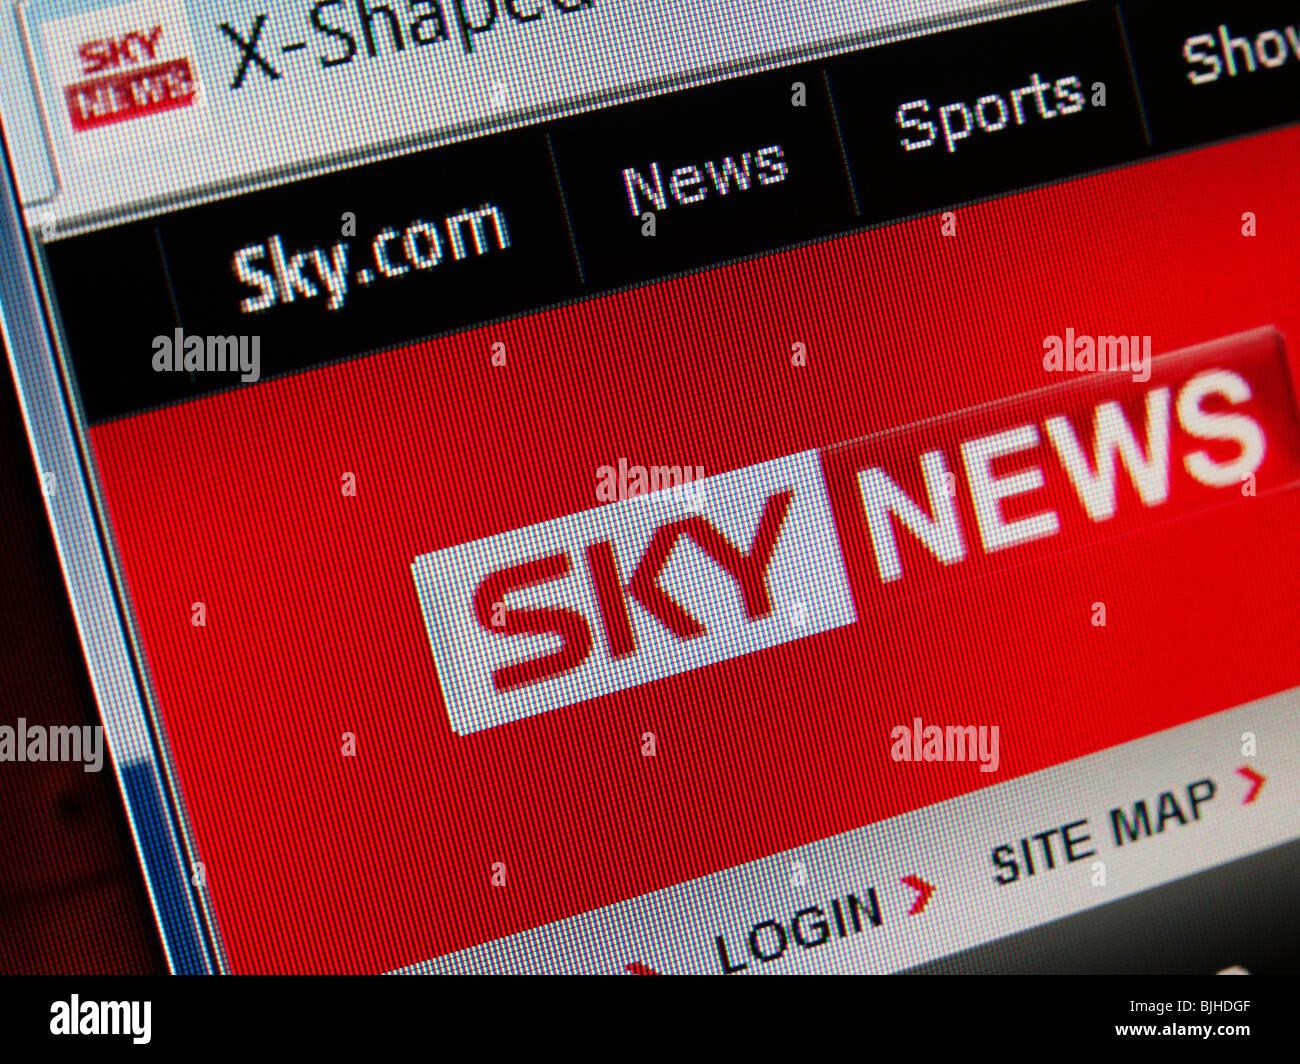 Sky News web page screen shot. - Stock Image